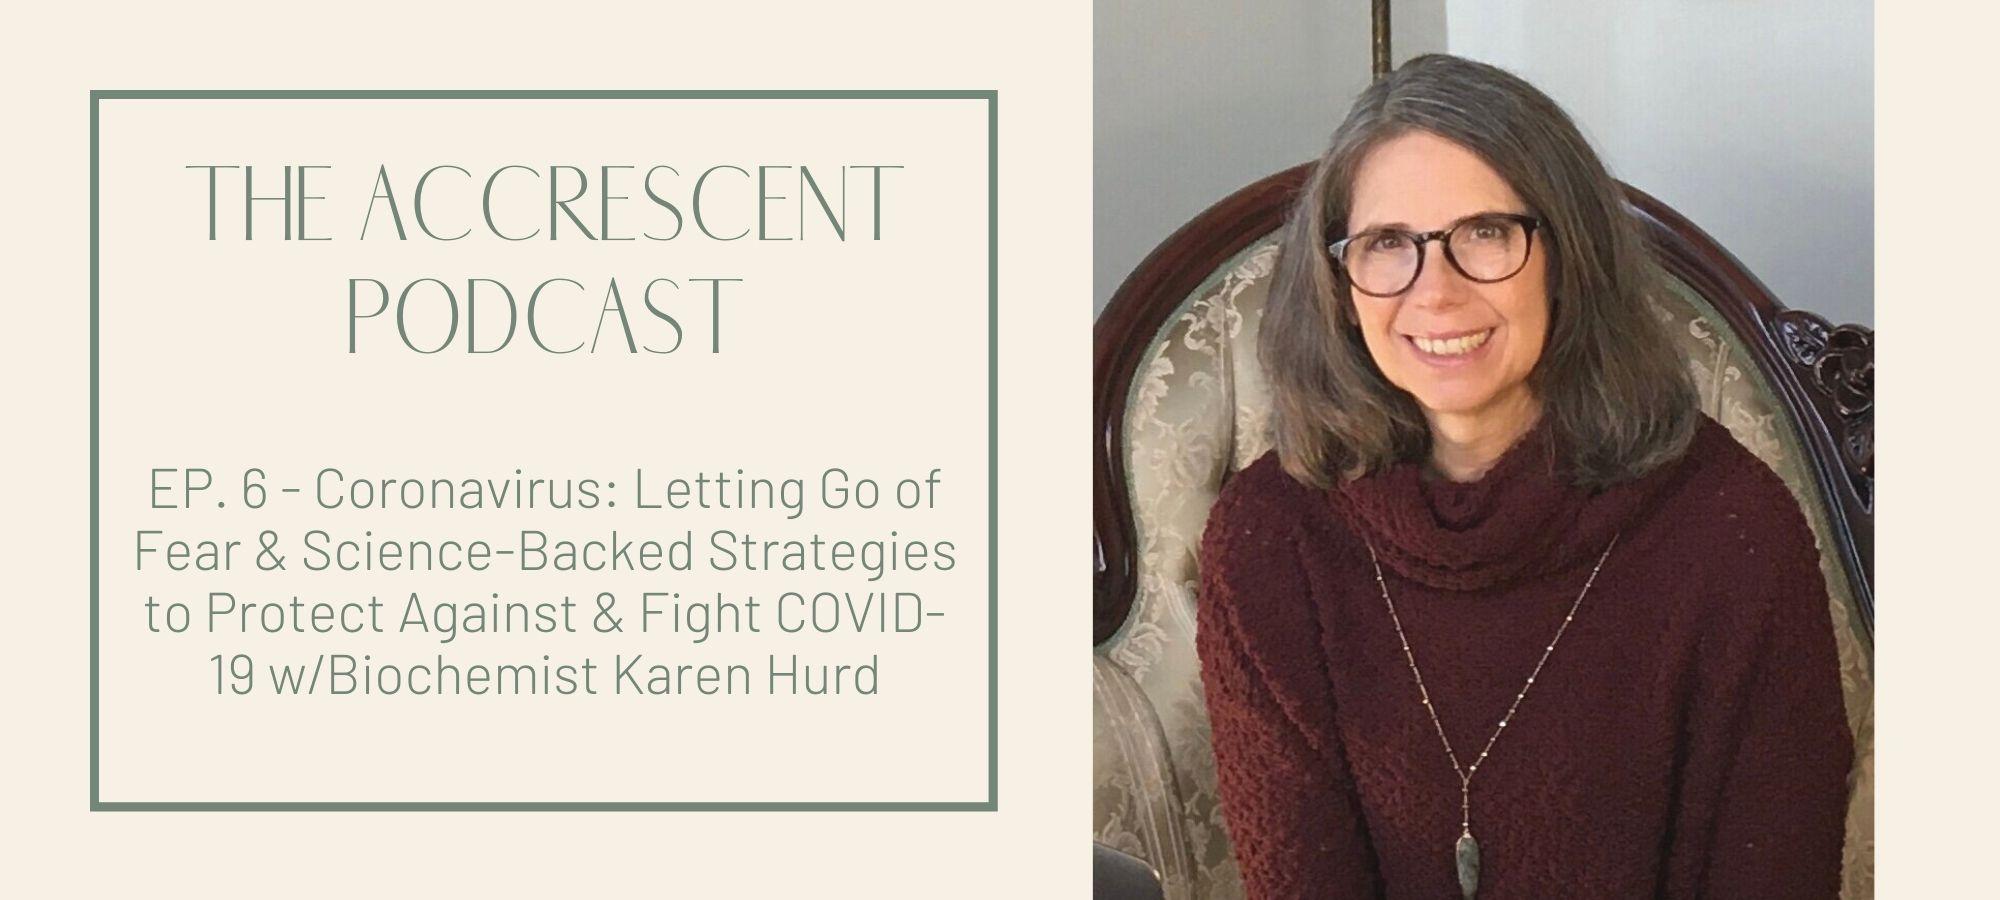 Coronavirus: Science-Backed Strategies to Protect Against & Fight COVID-19 w/Biochemist Karen Hurd